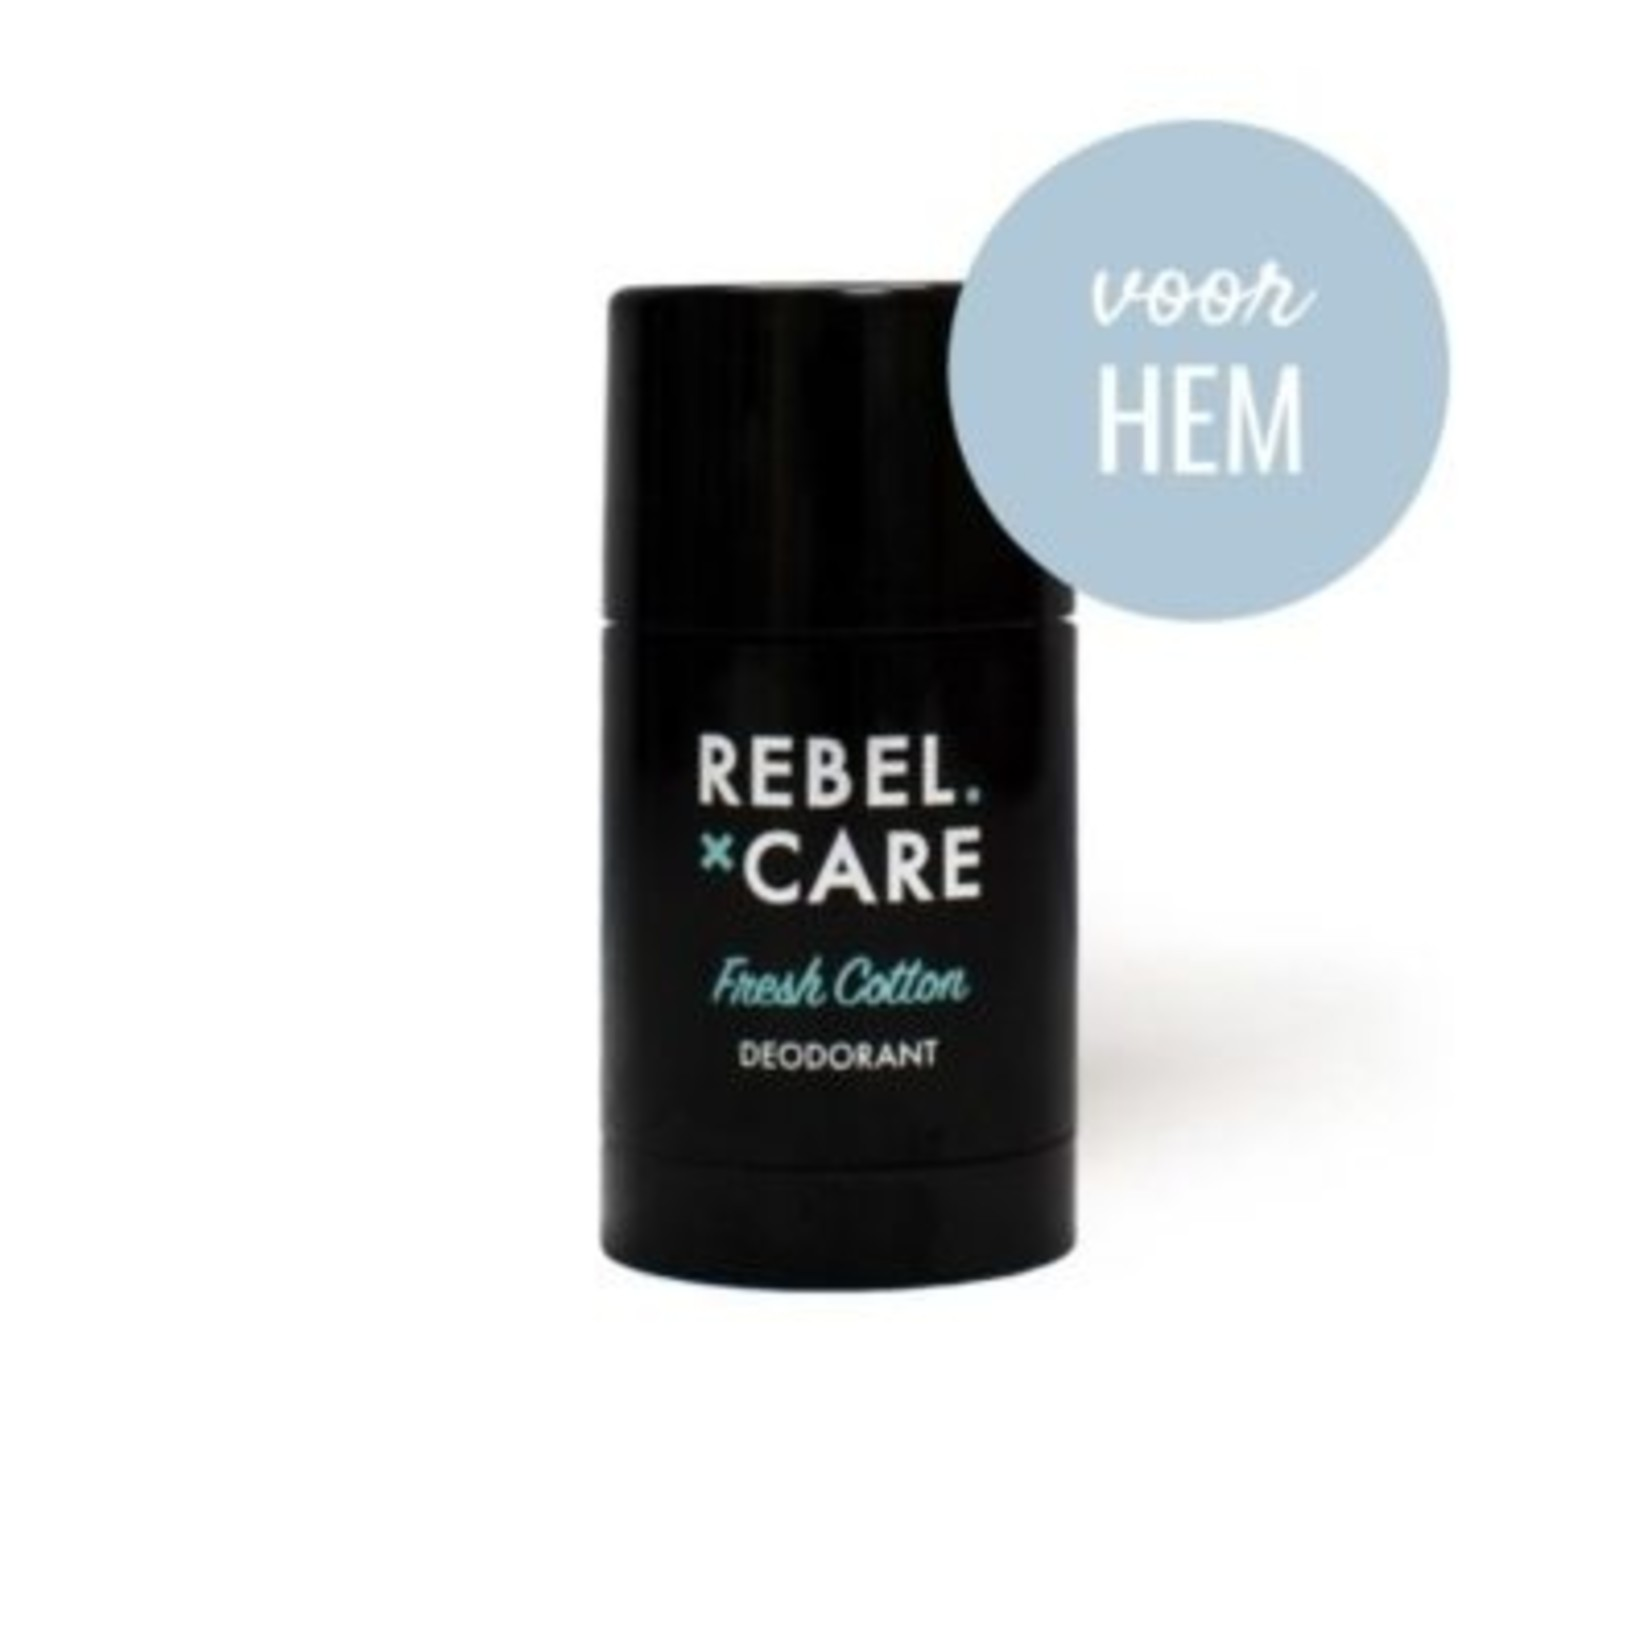 Loveli Loveli Deodorant Fresh Cotton Rebel Care 30 ml - voor hem